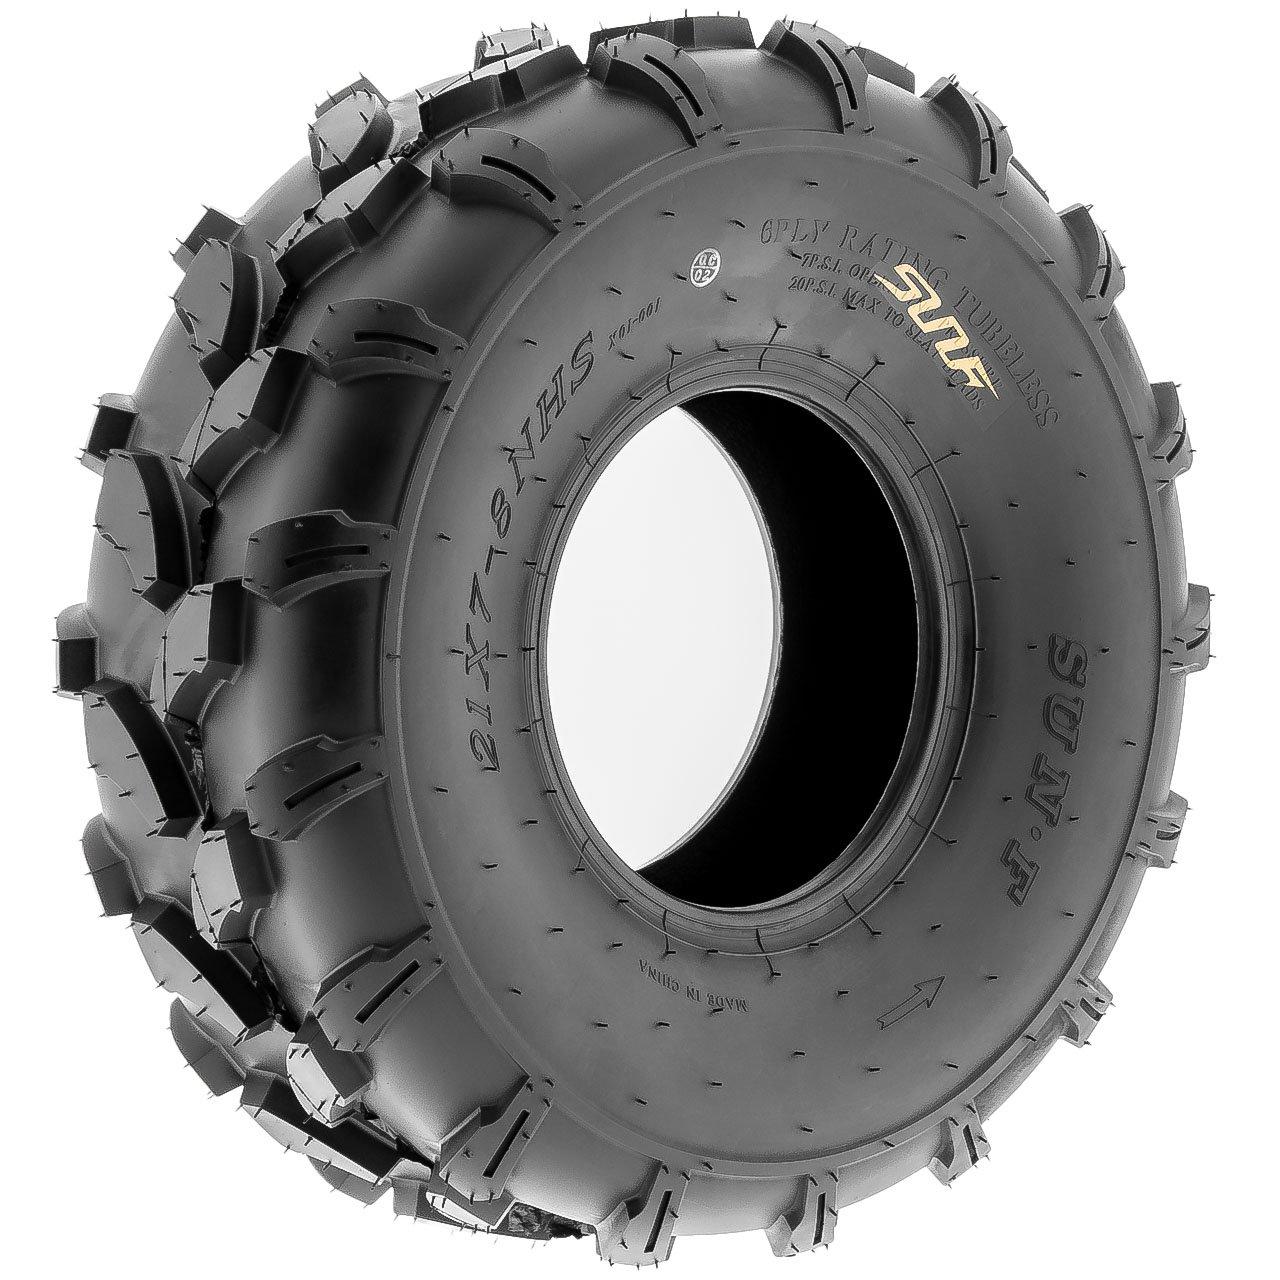 SunF A003 ATV/UTV/Lawn-Mowers Off-Road Tire 19x7-8, 6 PR, Directional Knobby Tread